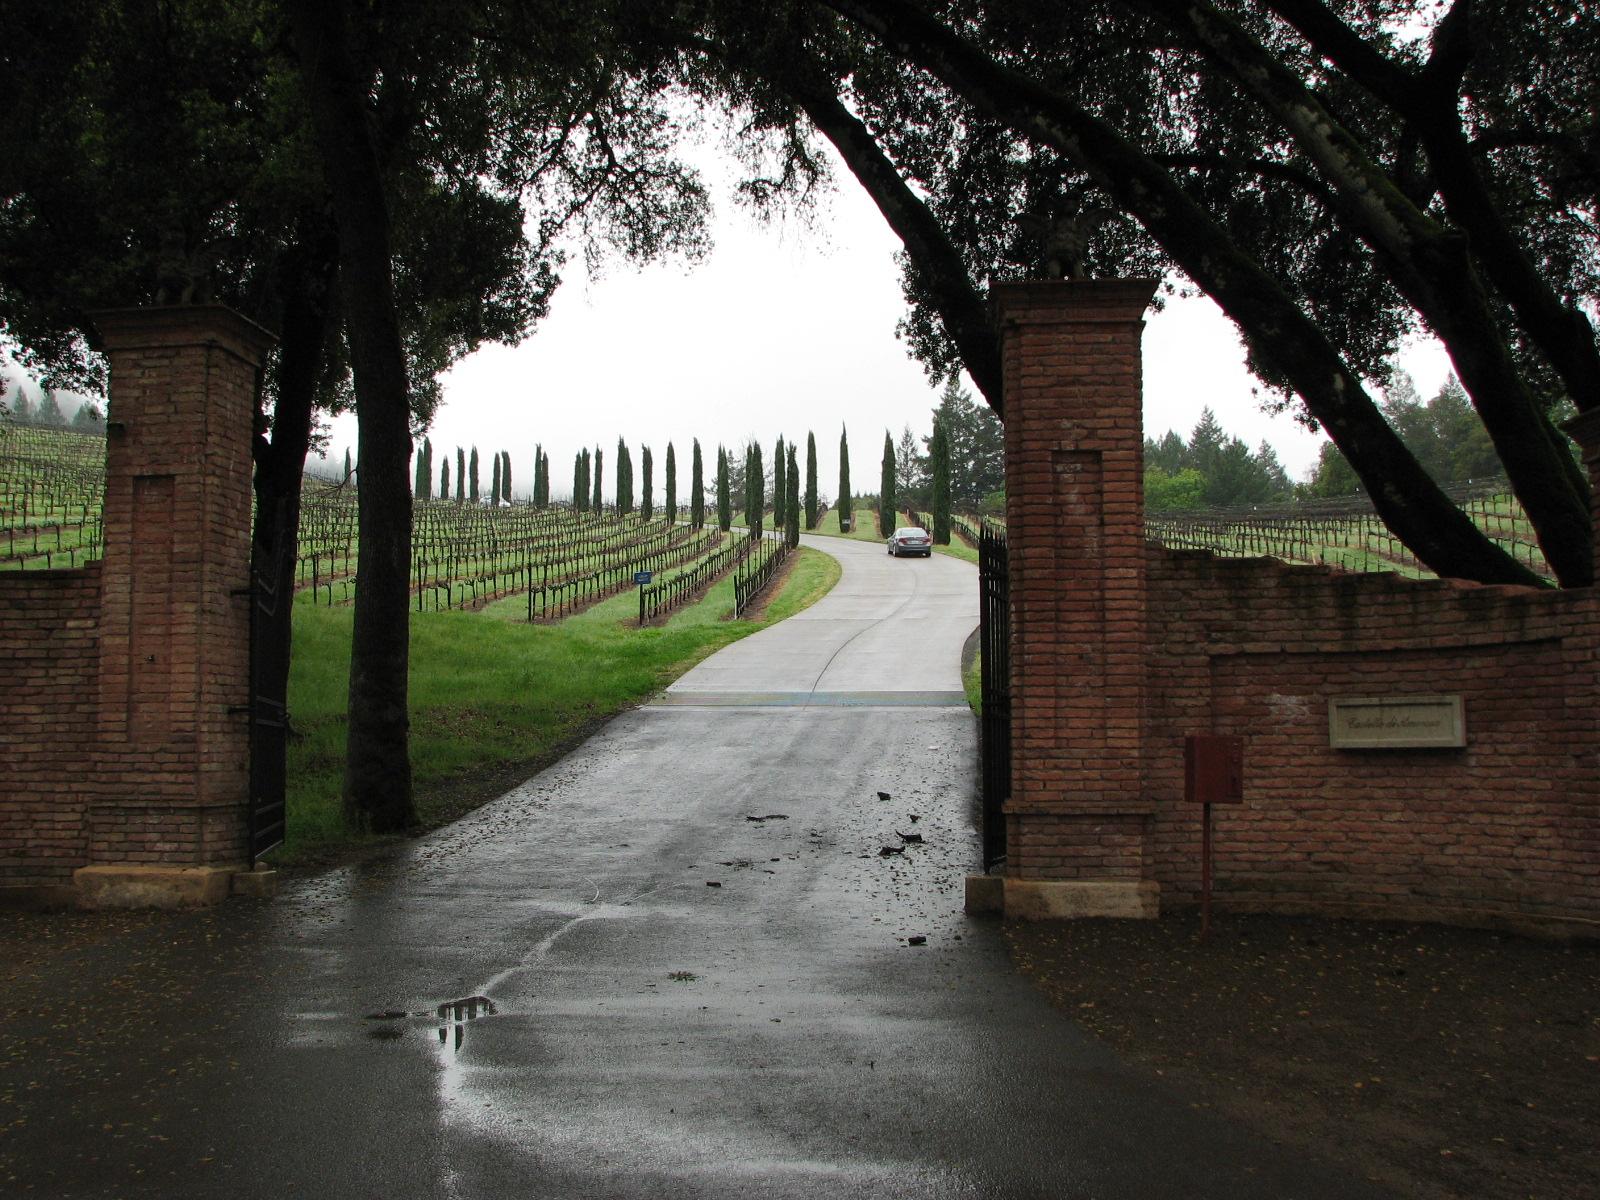 Prairie School Farms: Napa Valley adventures: Castello di Amorosa